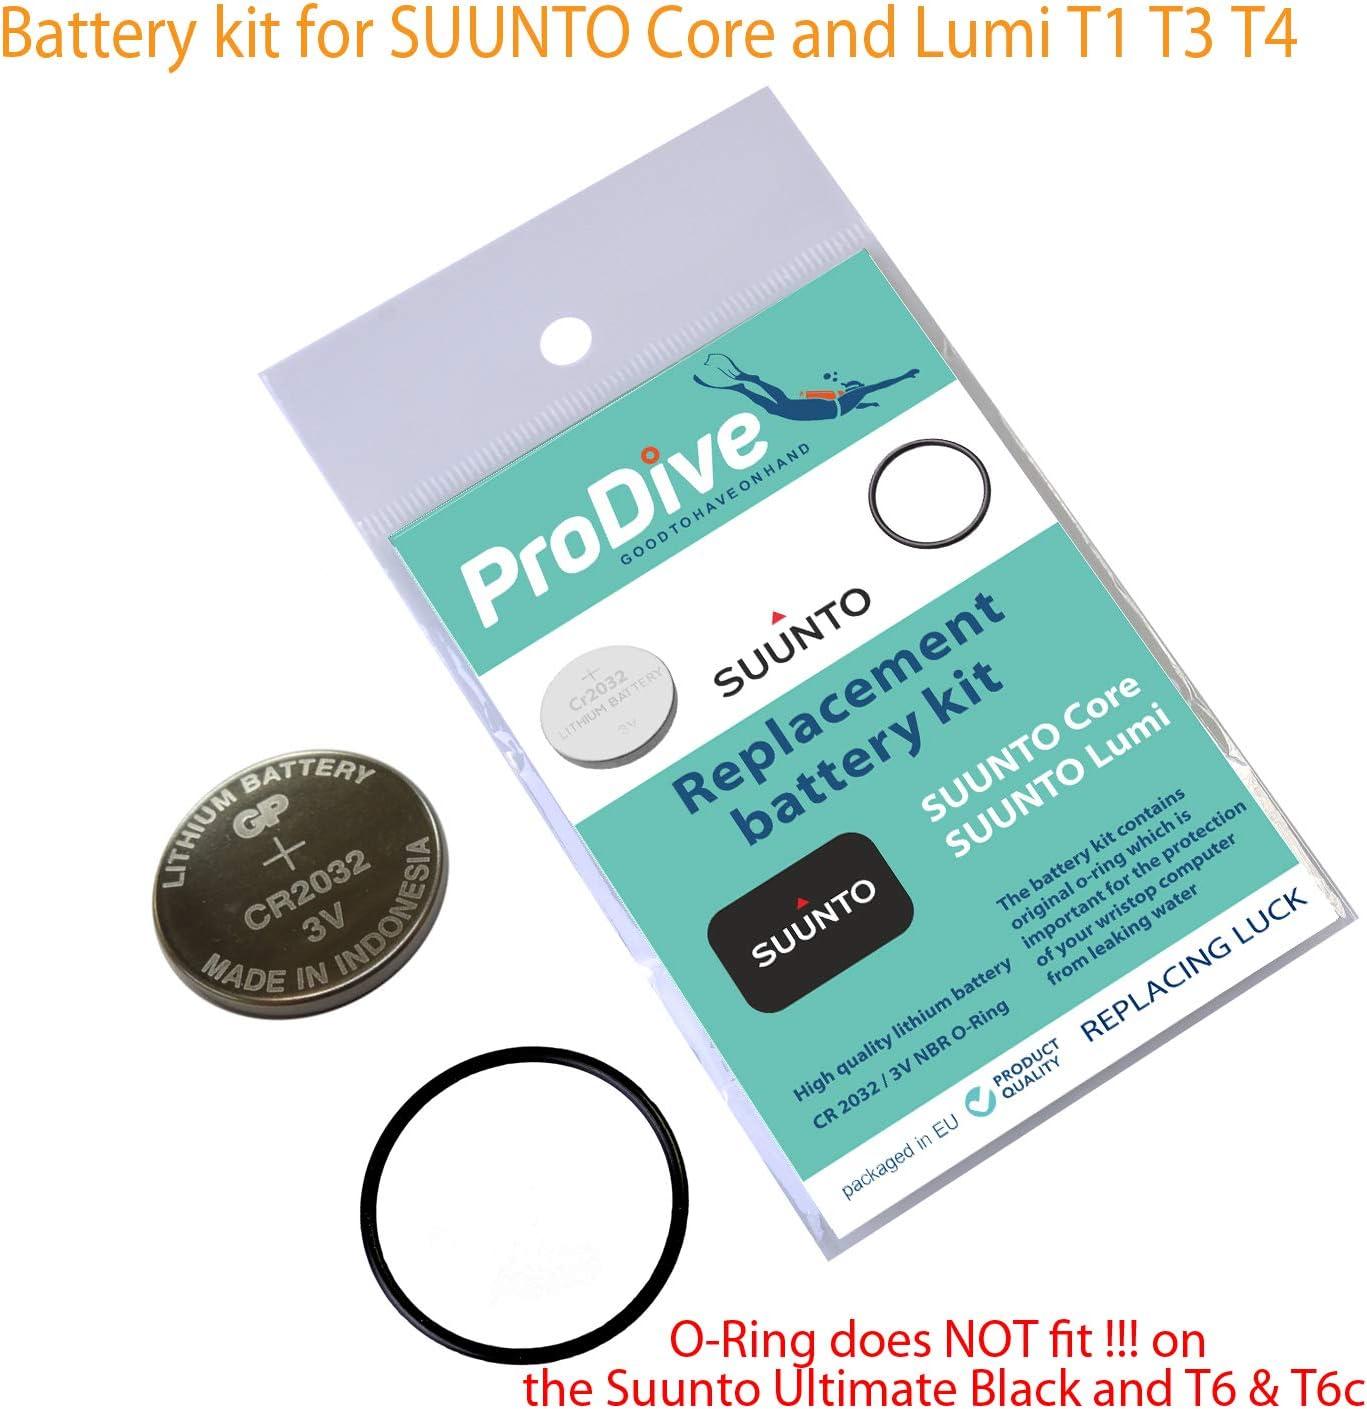 Battery kit for Suunto Core Lumi T4 T3 T1